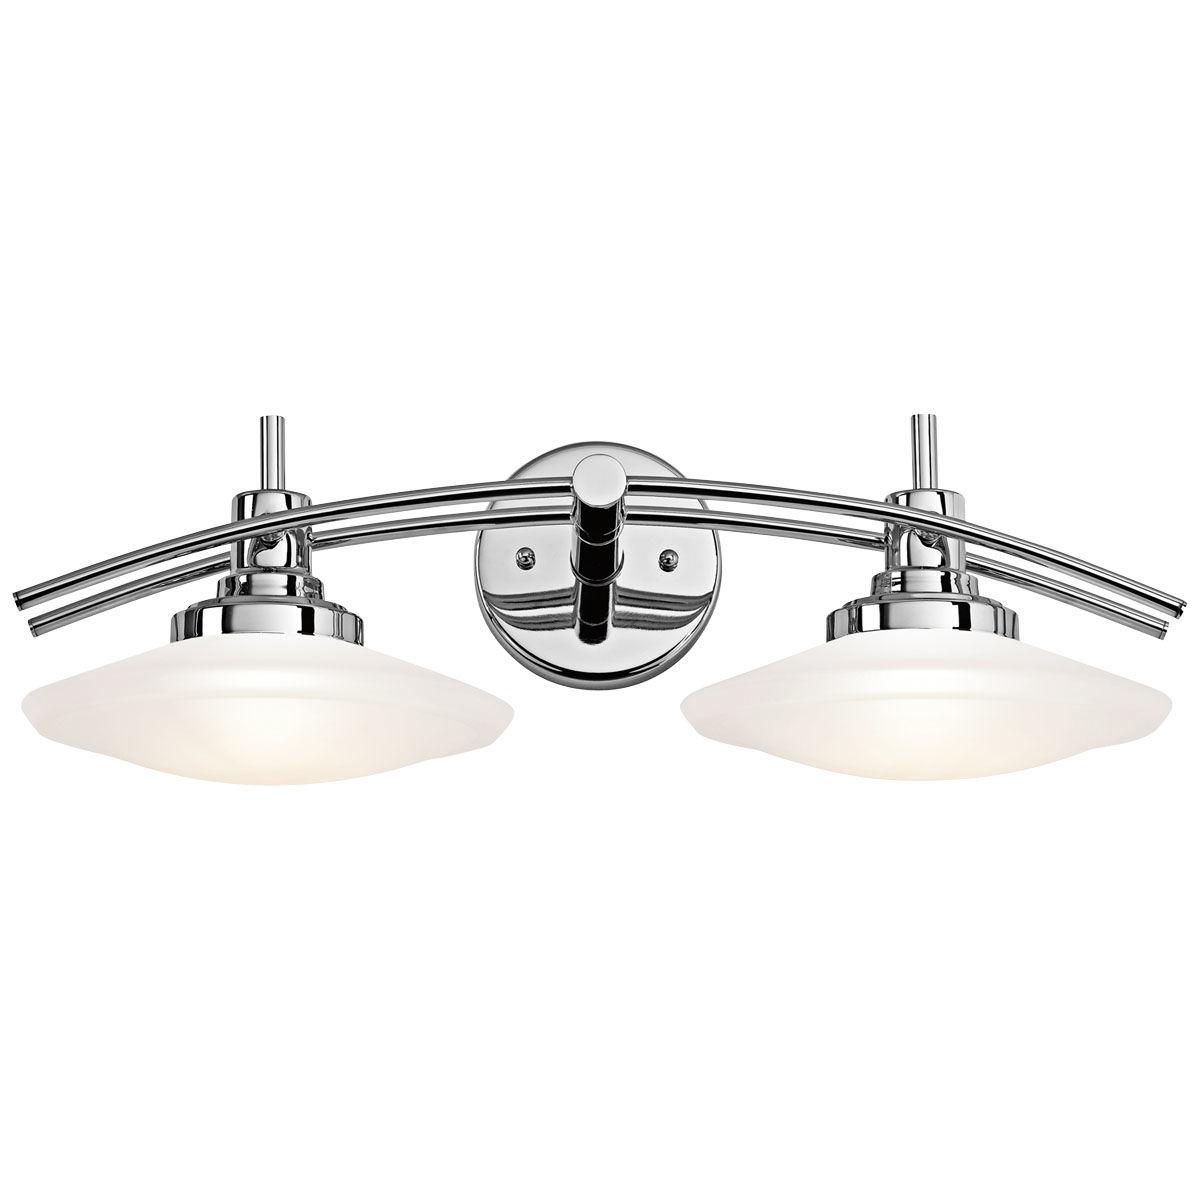 Bathroom Lighting Chrome kichler 6162 structures bathroom light - build